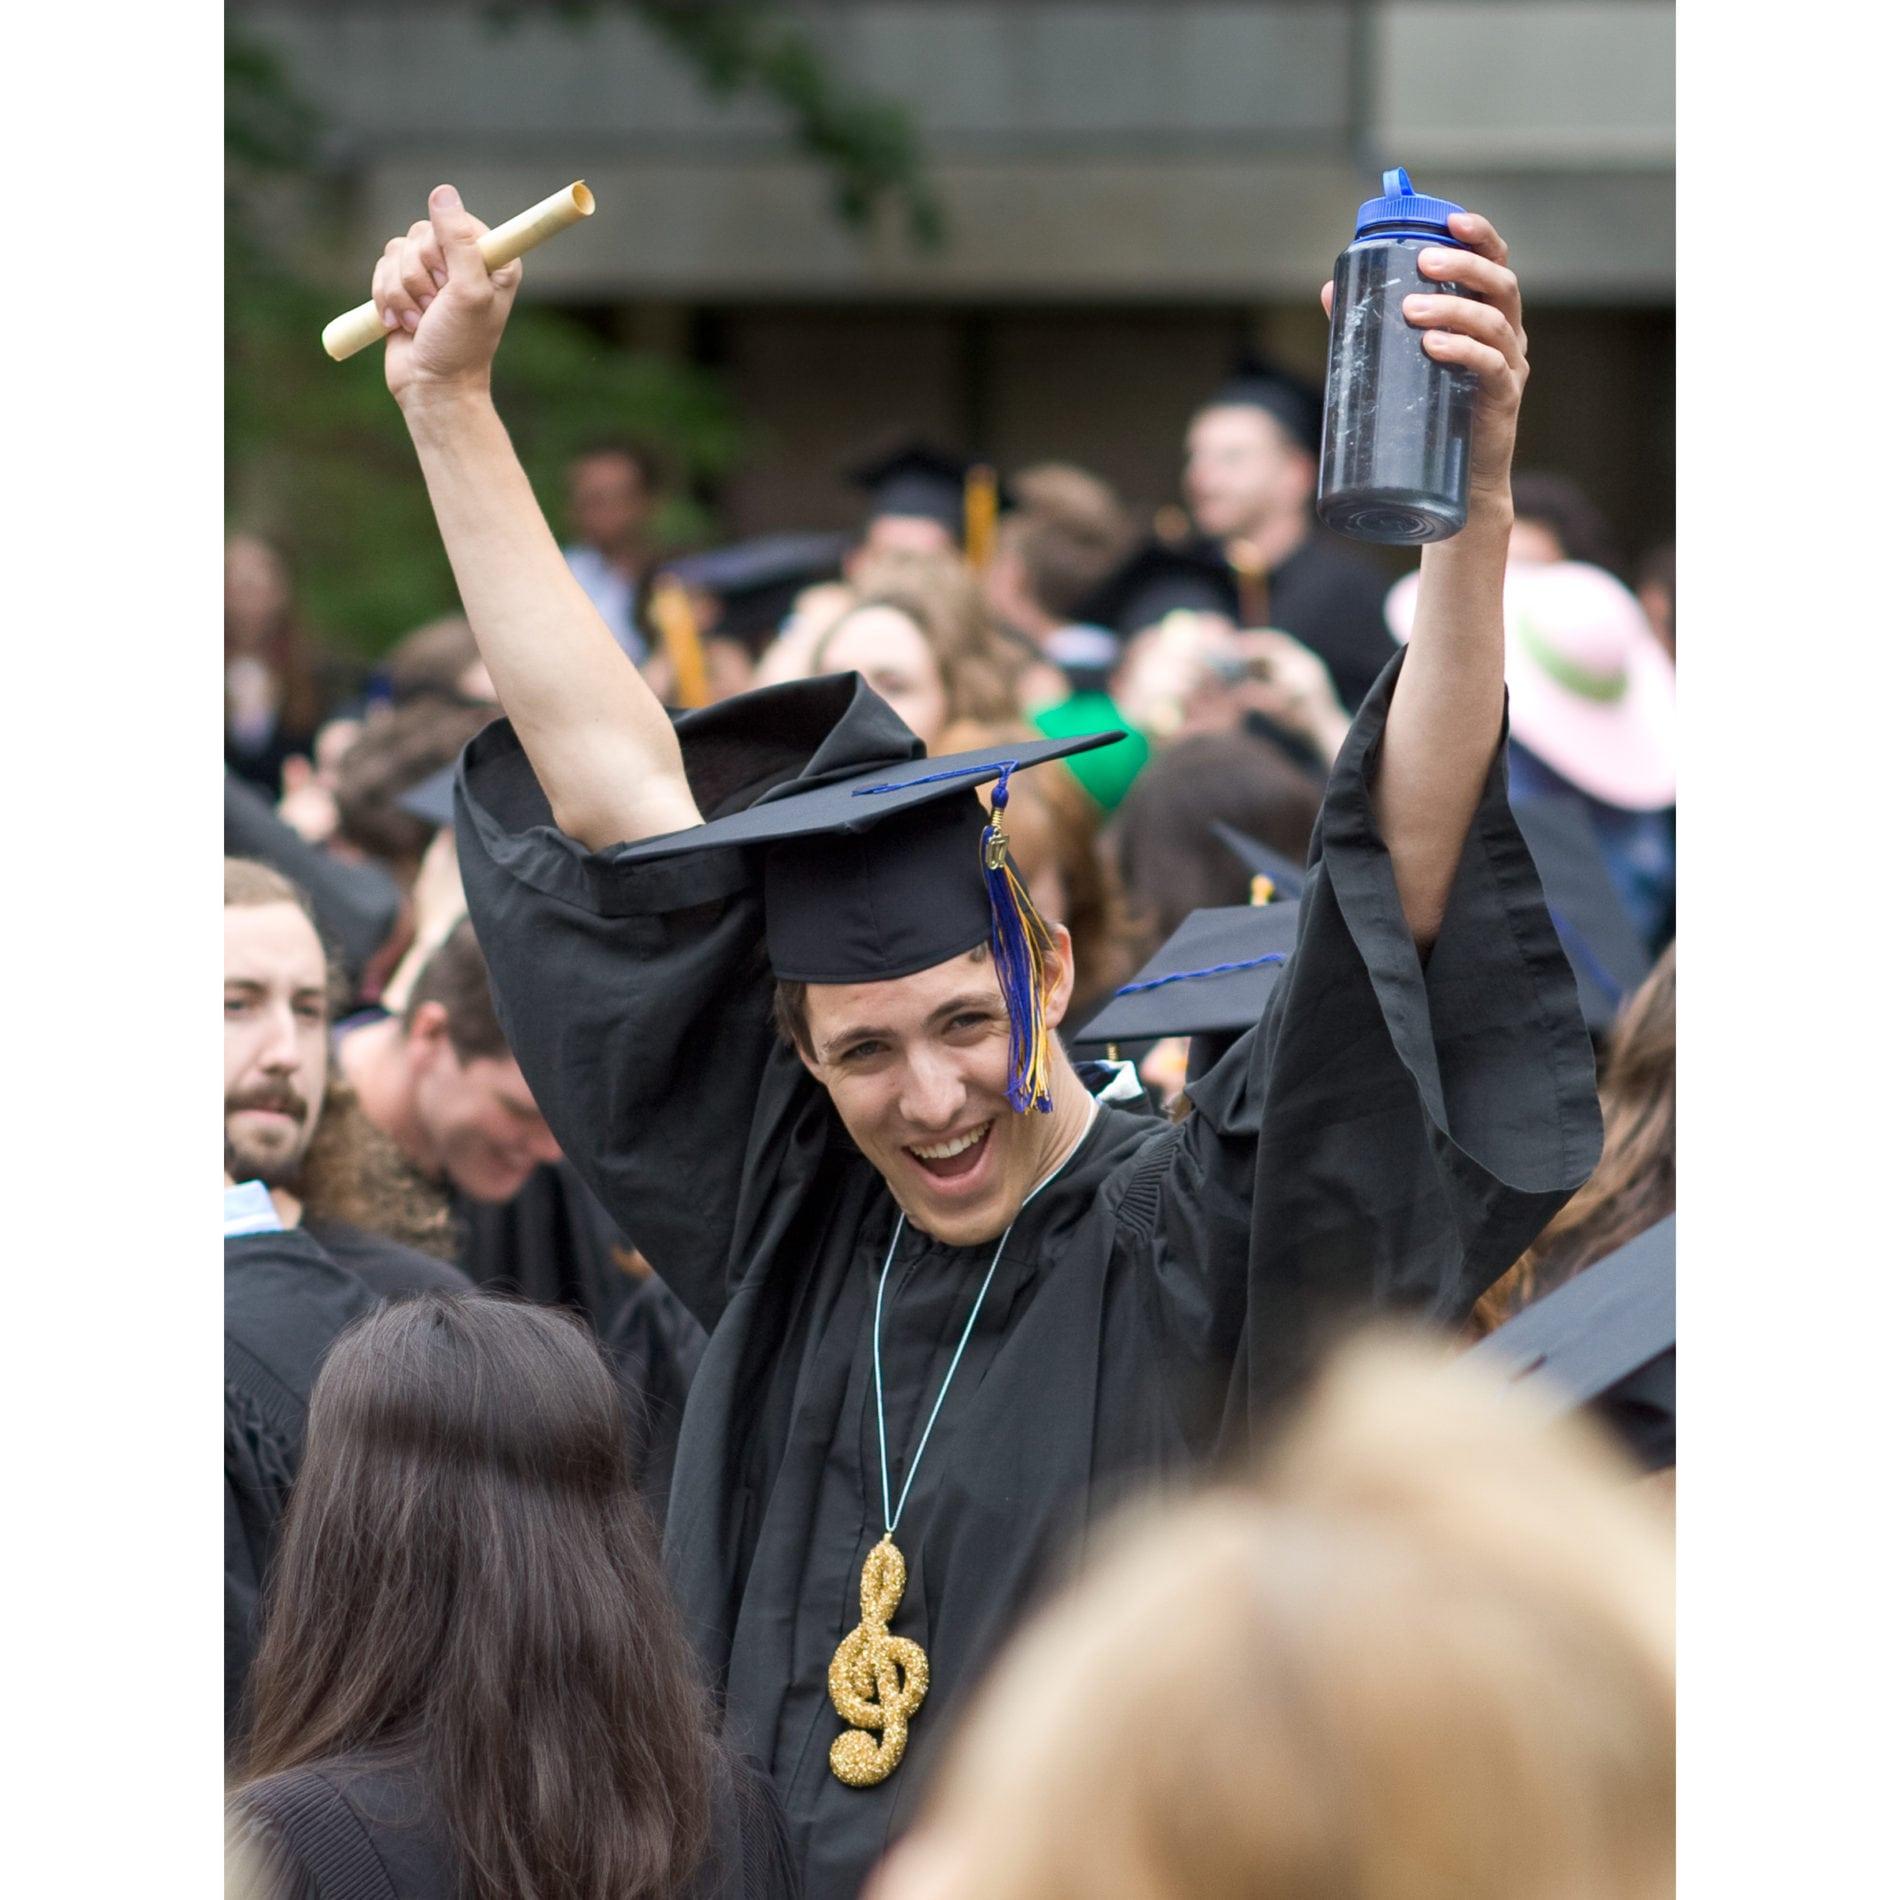 3 wishes io graduation